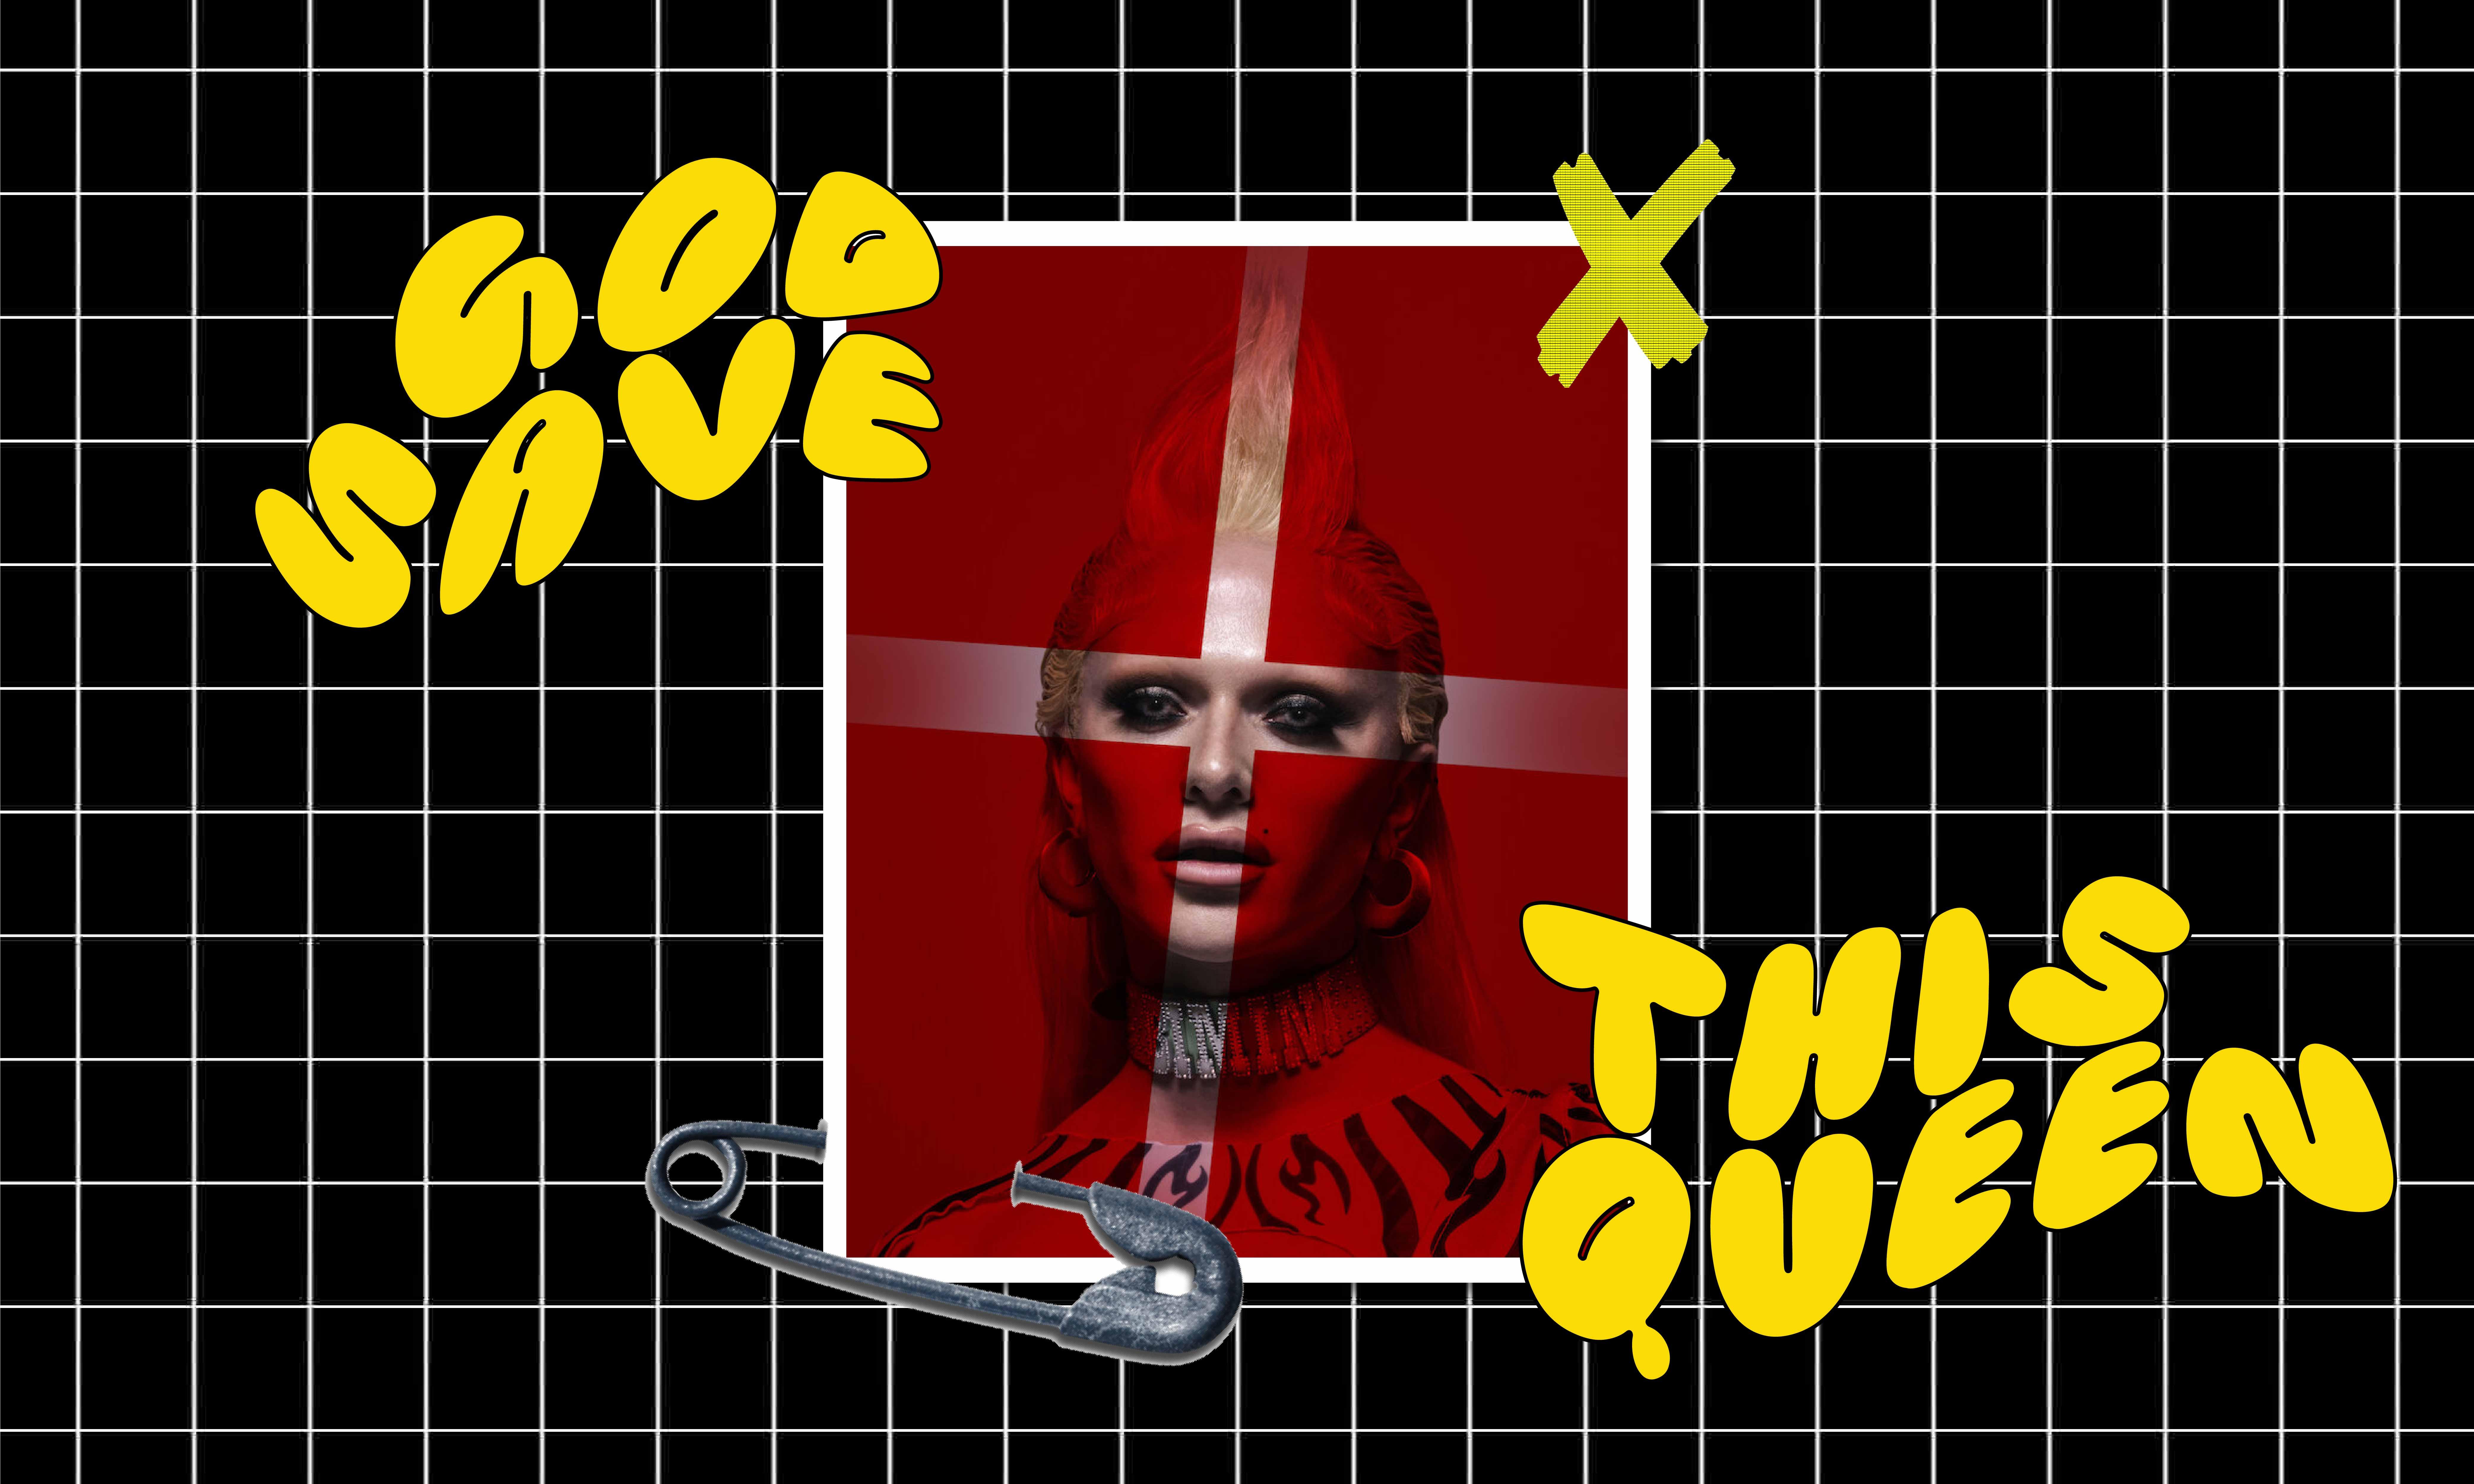 Bimini's 'God Save This Queen' - POPJUICE